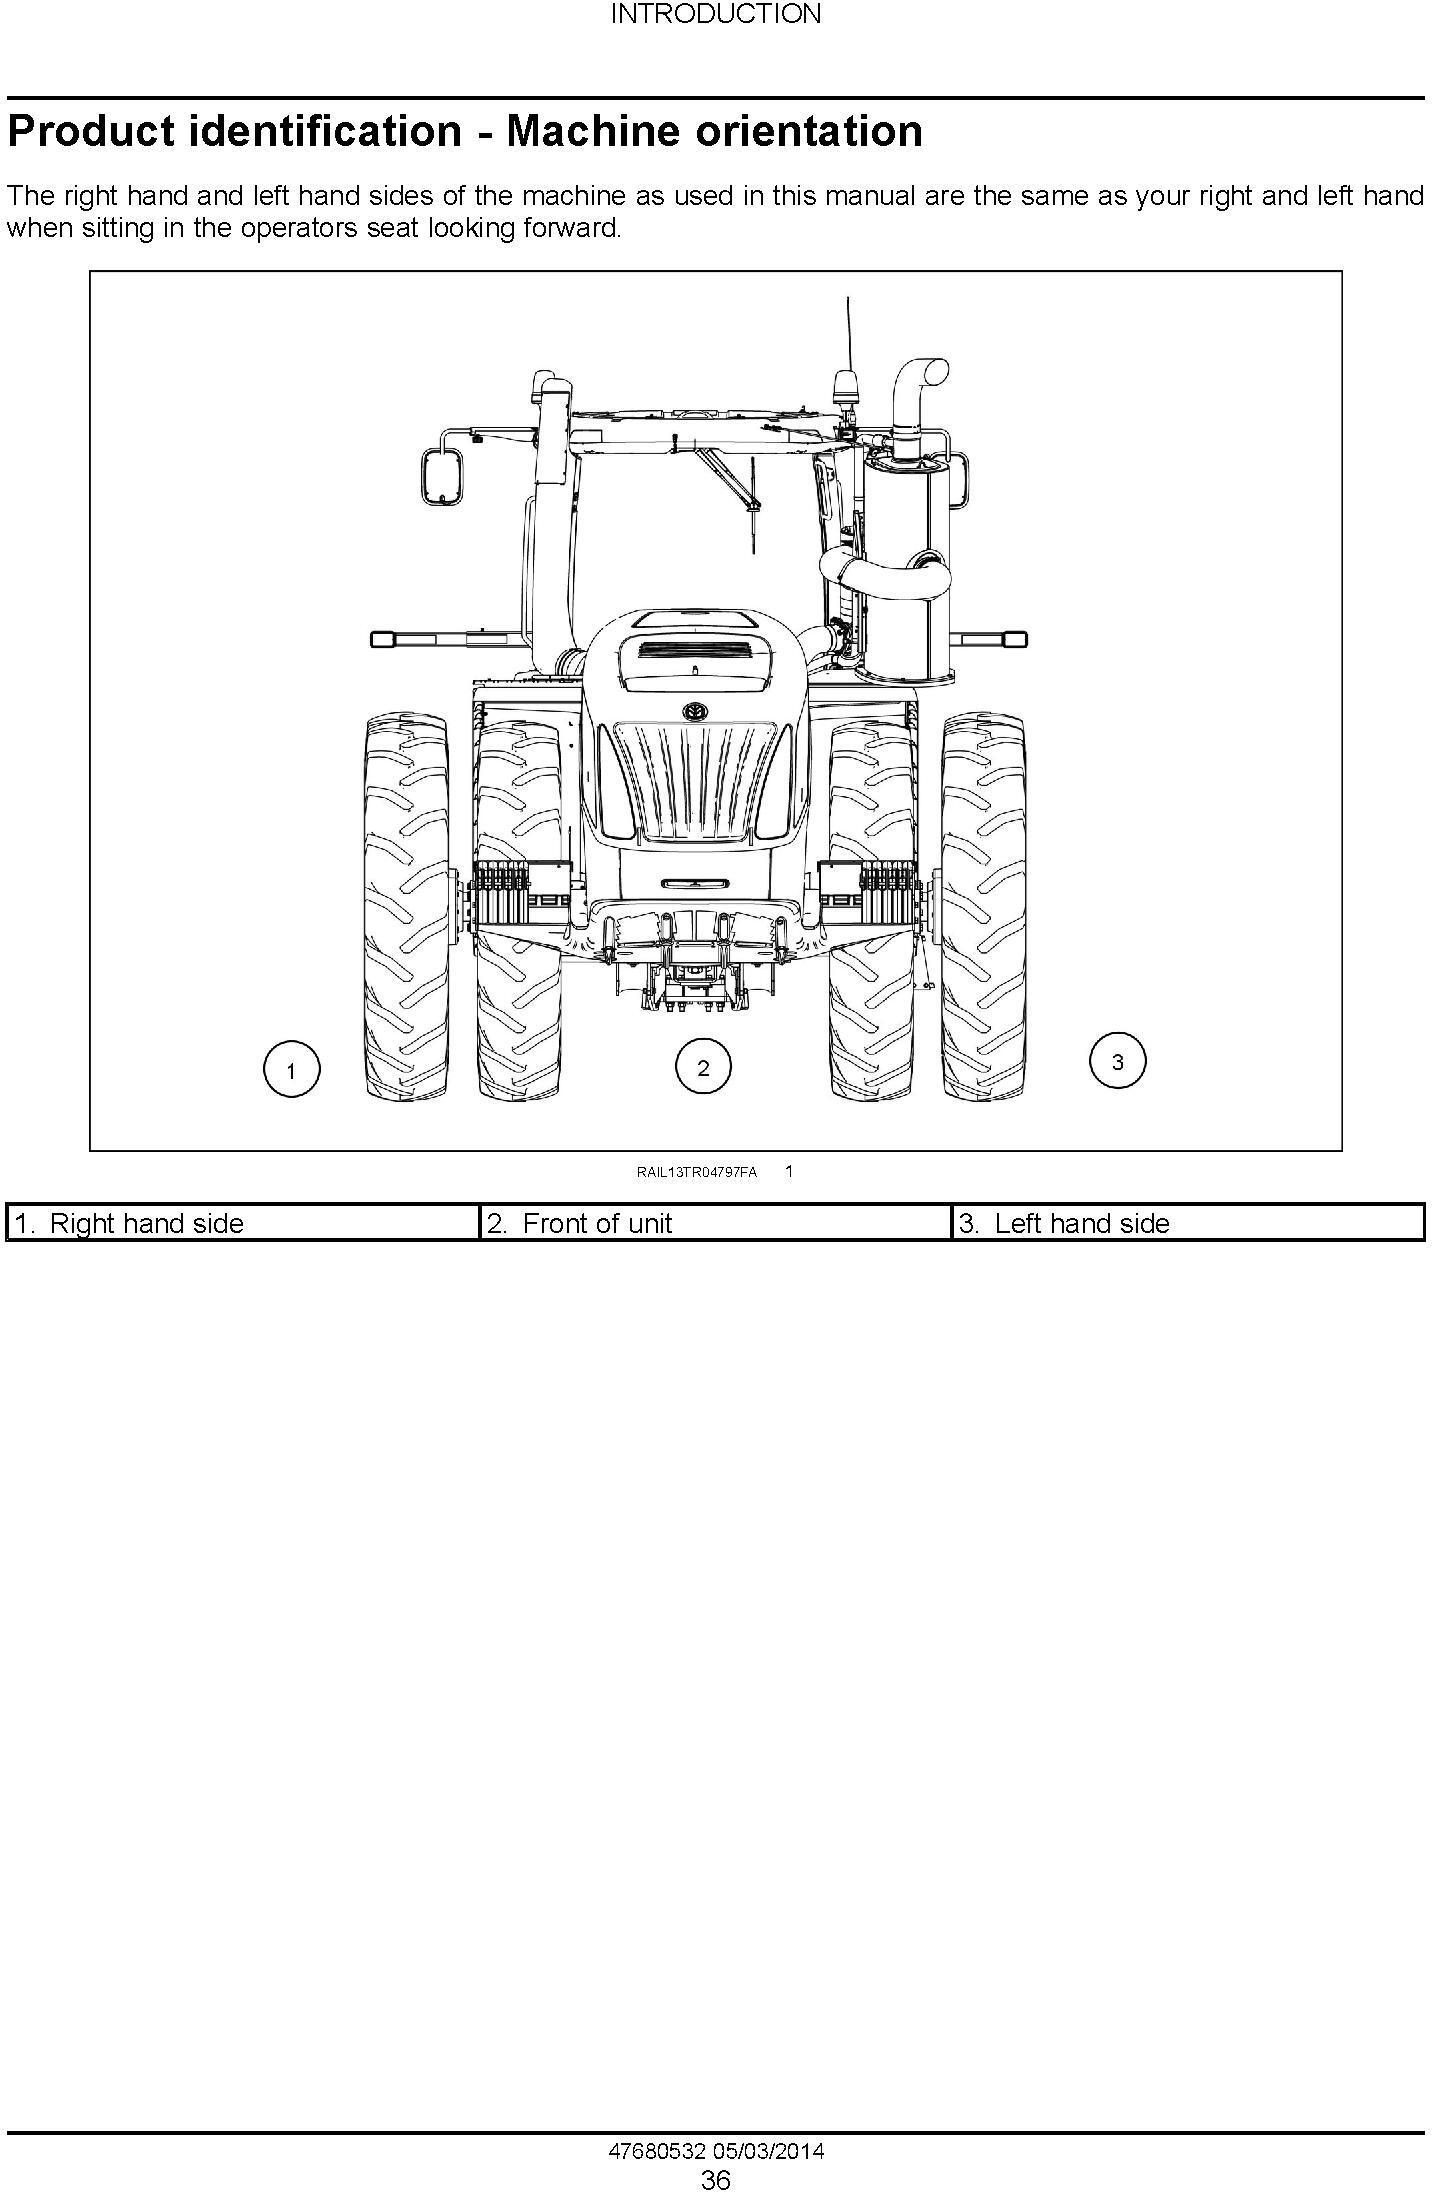 New Holland T9.435, T9.480, T9.530, T9.565, T9.600, T9.645, T9.700 T4B Final USA Tractor Service Manual - 1